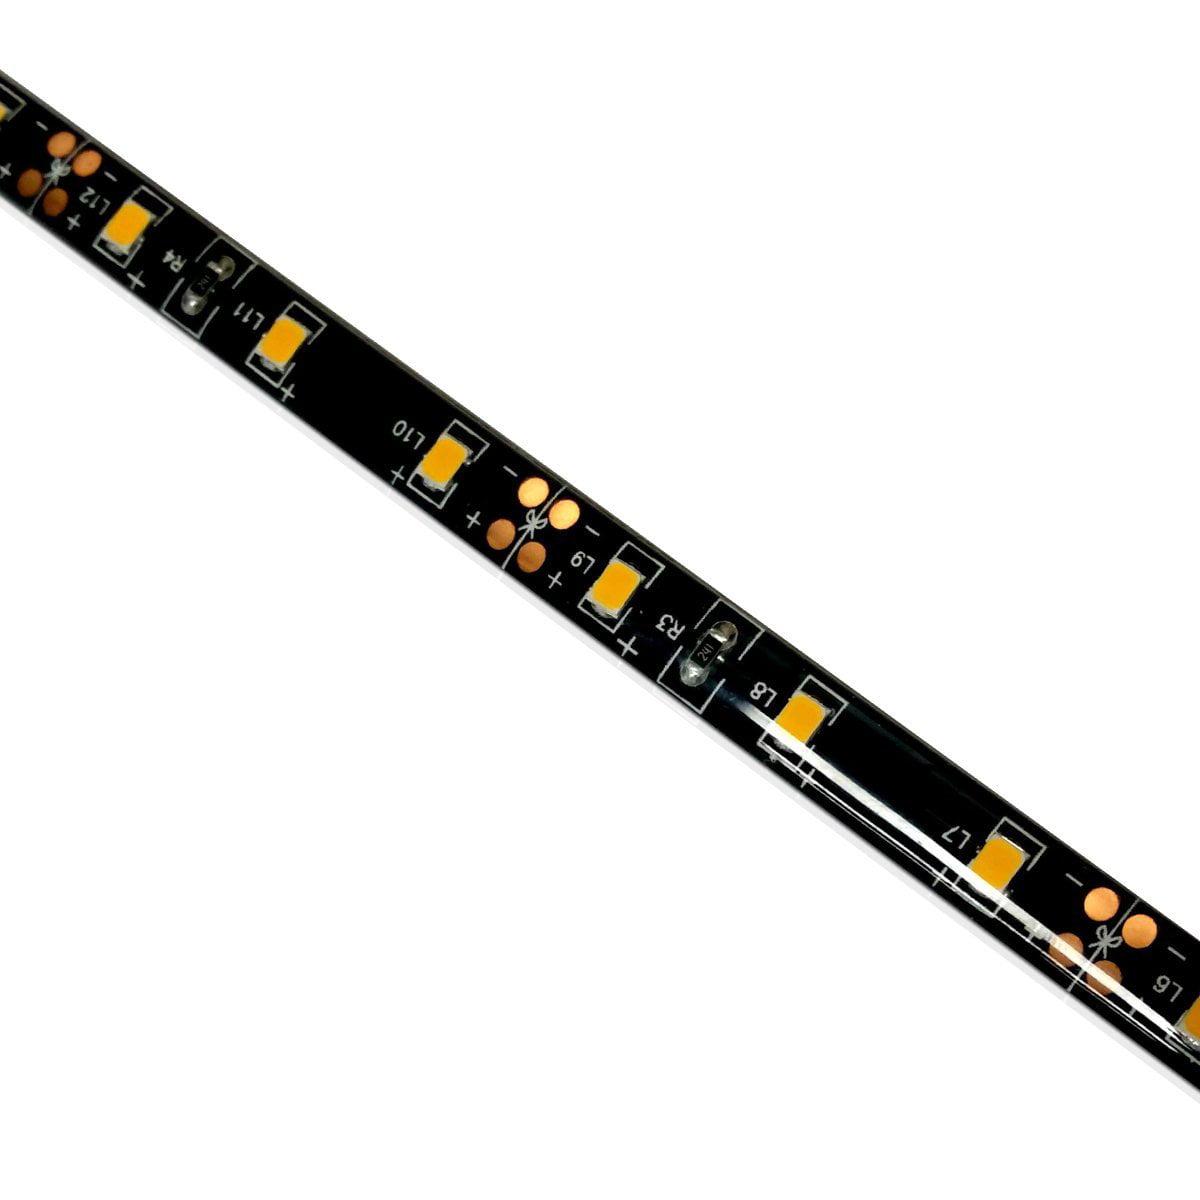 Dream Lighting 12V LED 72inch Flexible Strip Light Waterproof Decorative Light Fixture for RV Campervan Trailer Boat Cabinet Decorating Under Car Body Blue Light